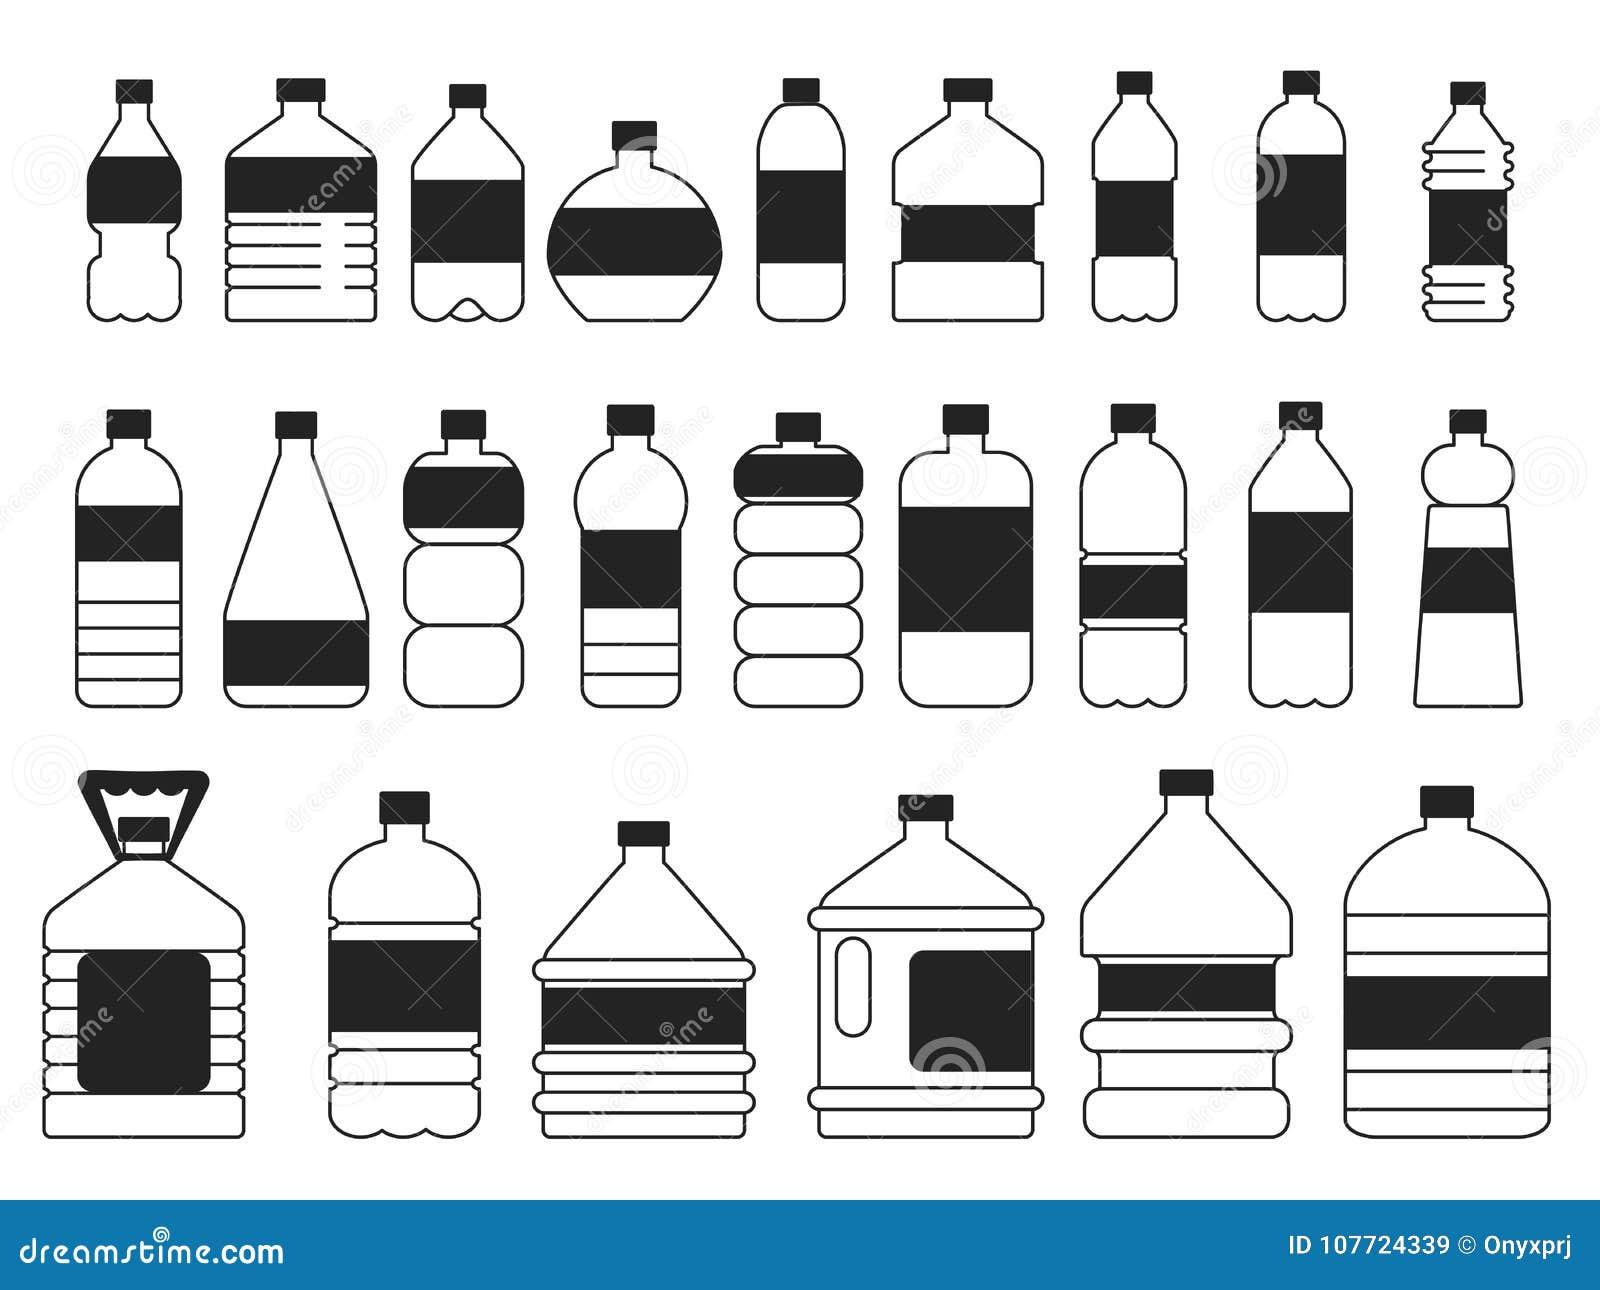 Monochrome Pictures Set Of Plastic Bottles Symbols Of Packaging